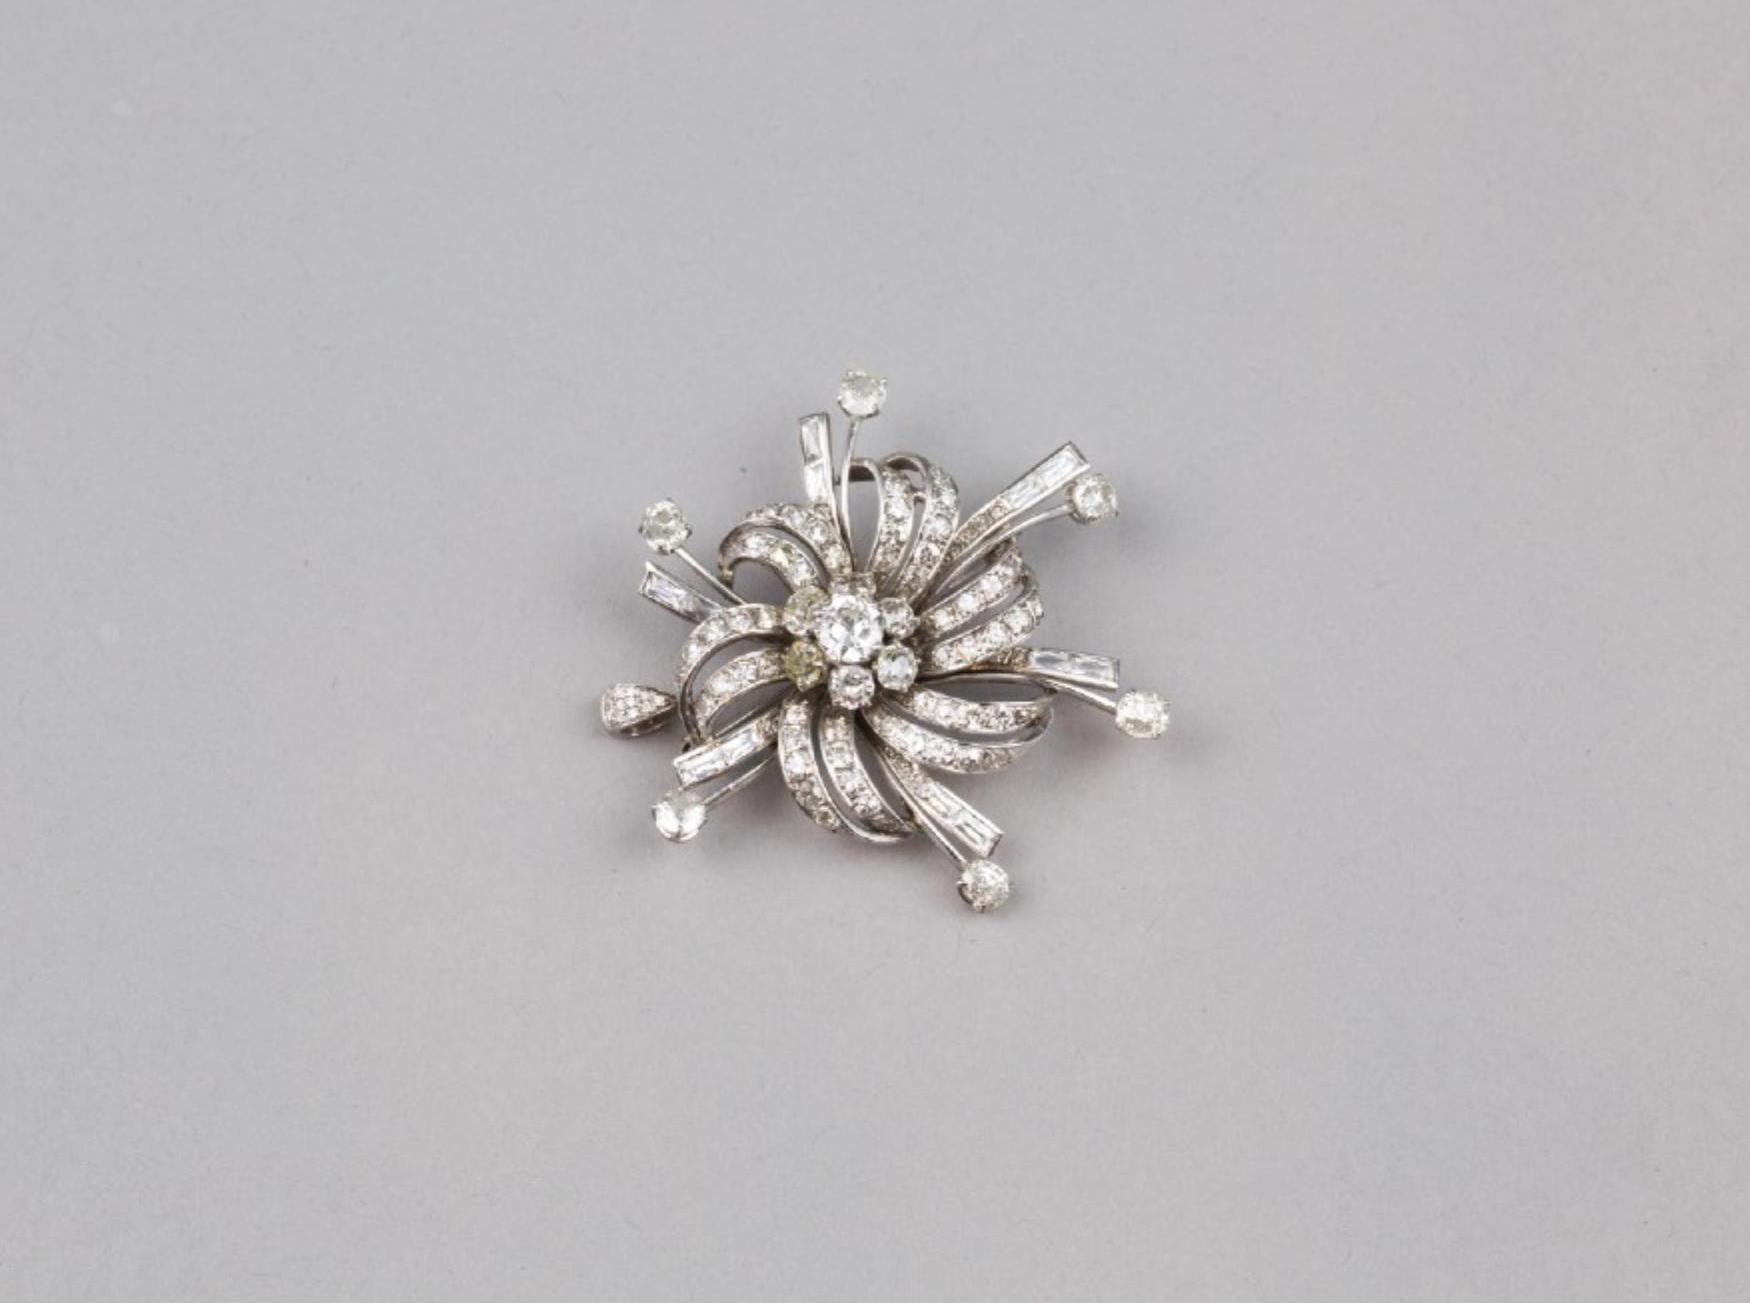 Lot 45 - A 18K White Gold Flower Heart Diamond Brooch